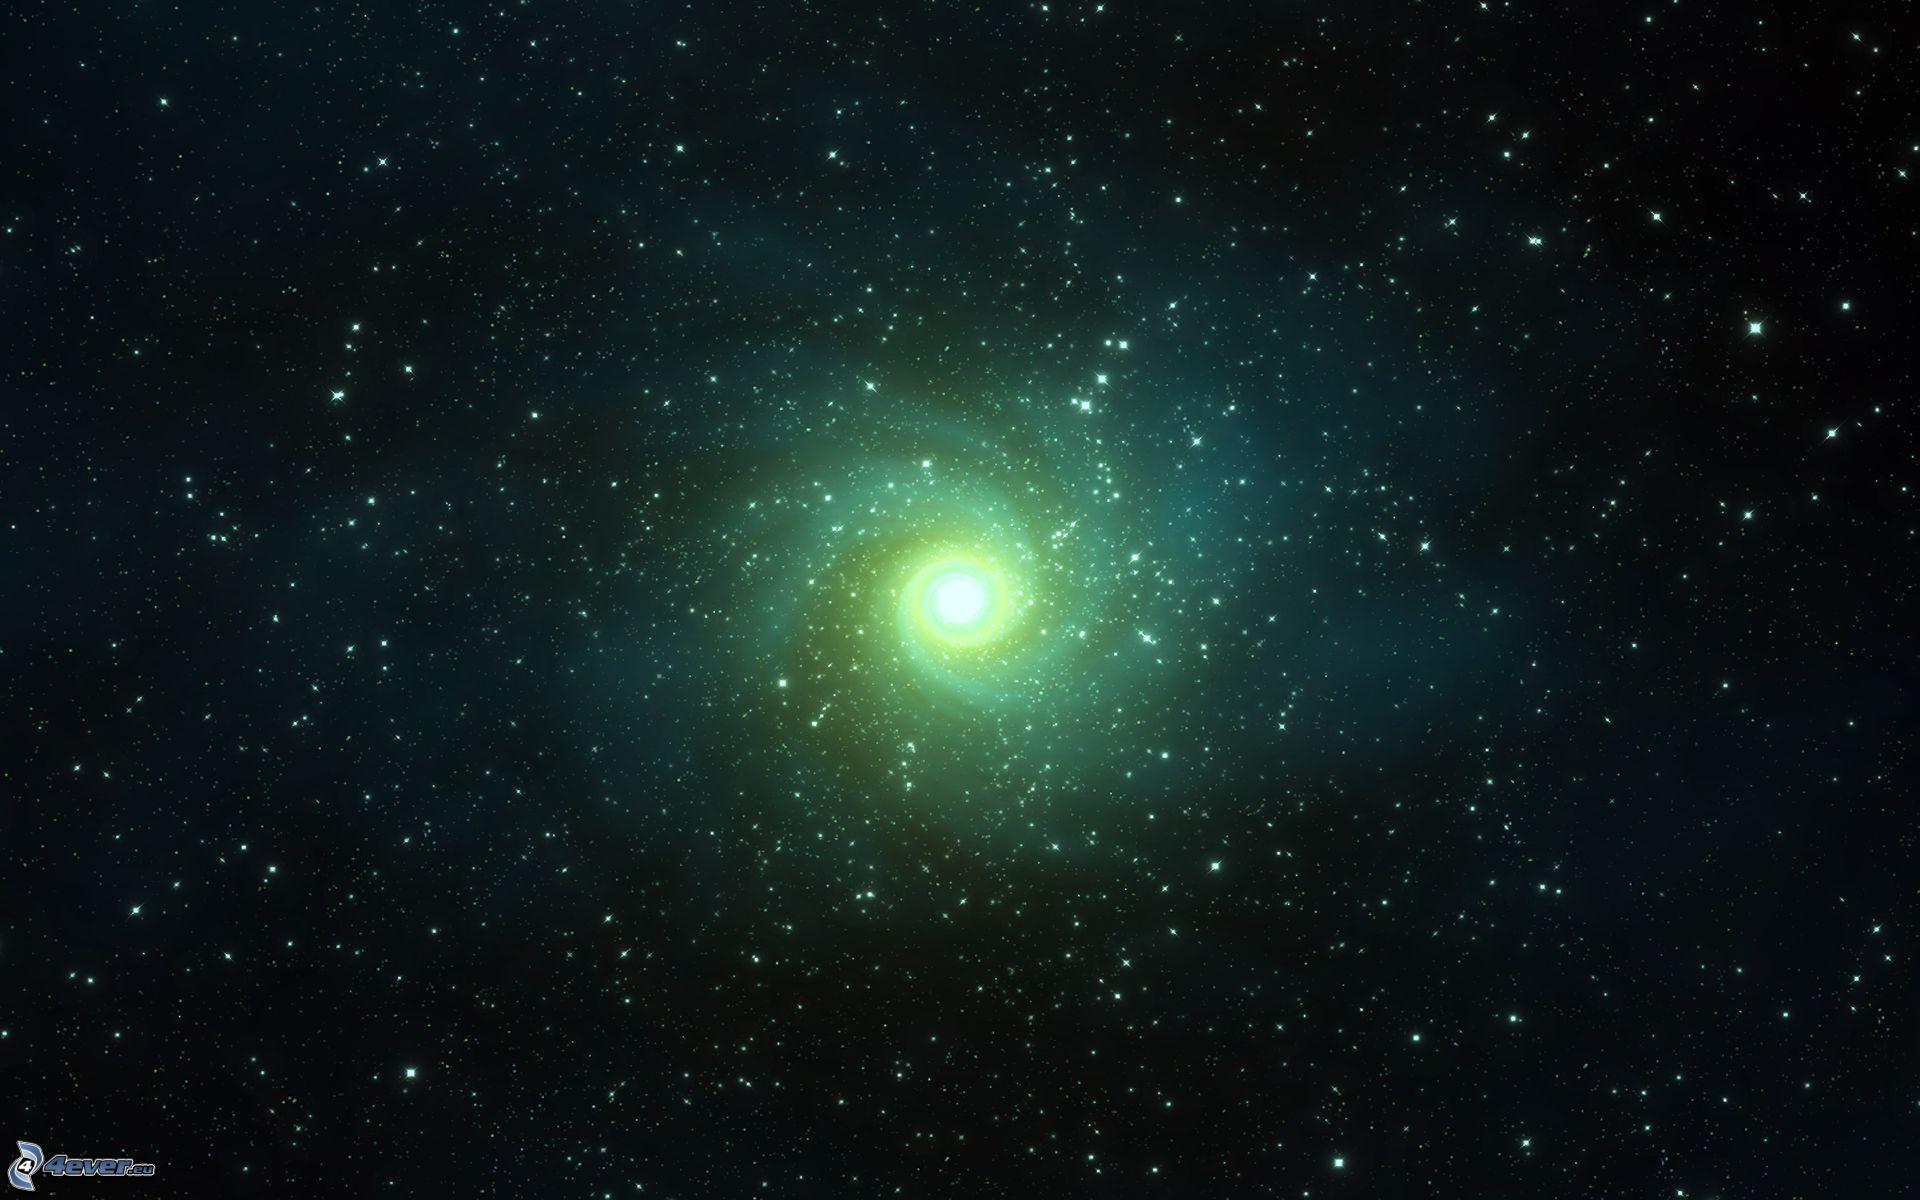 Pin Weltraum Sterne Nebel Bild 1920x1080 Picture on Pinterest